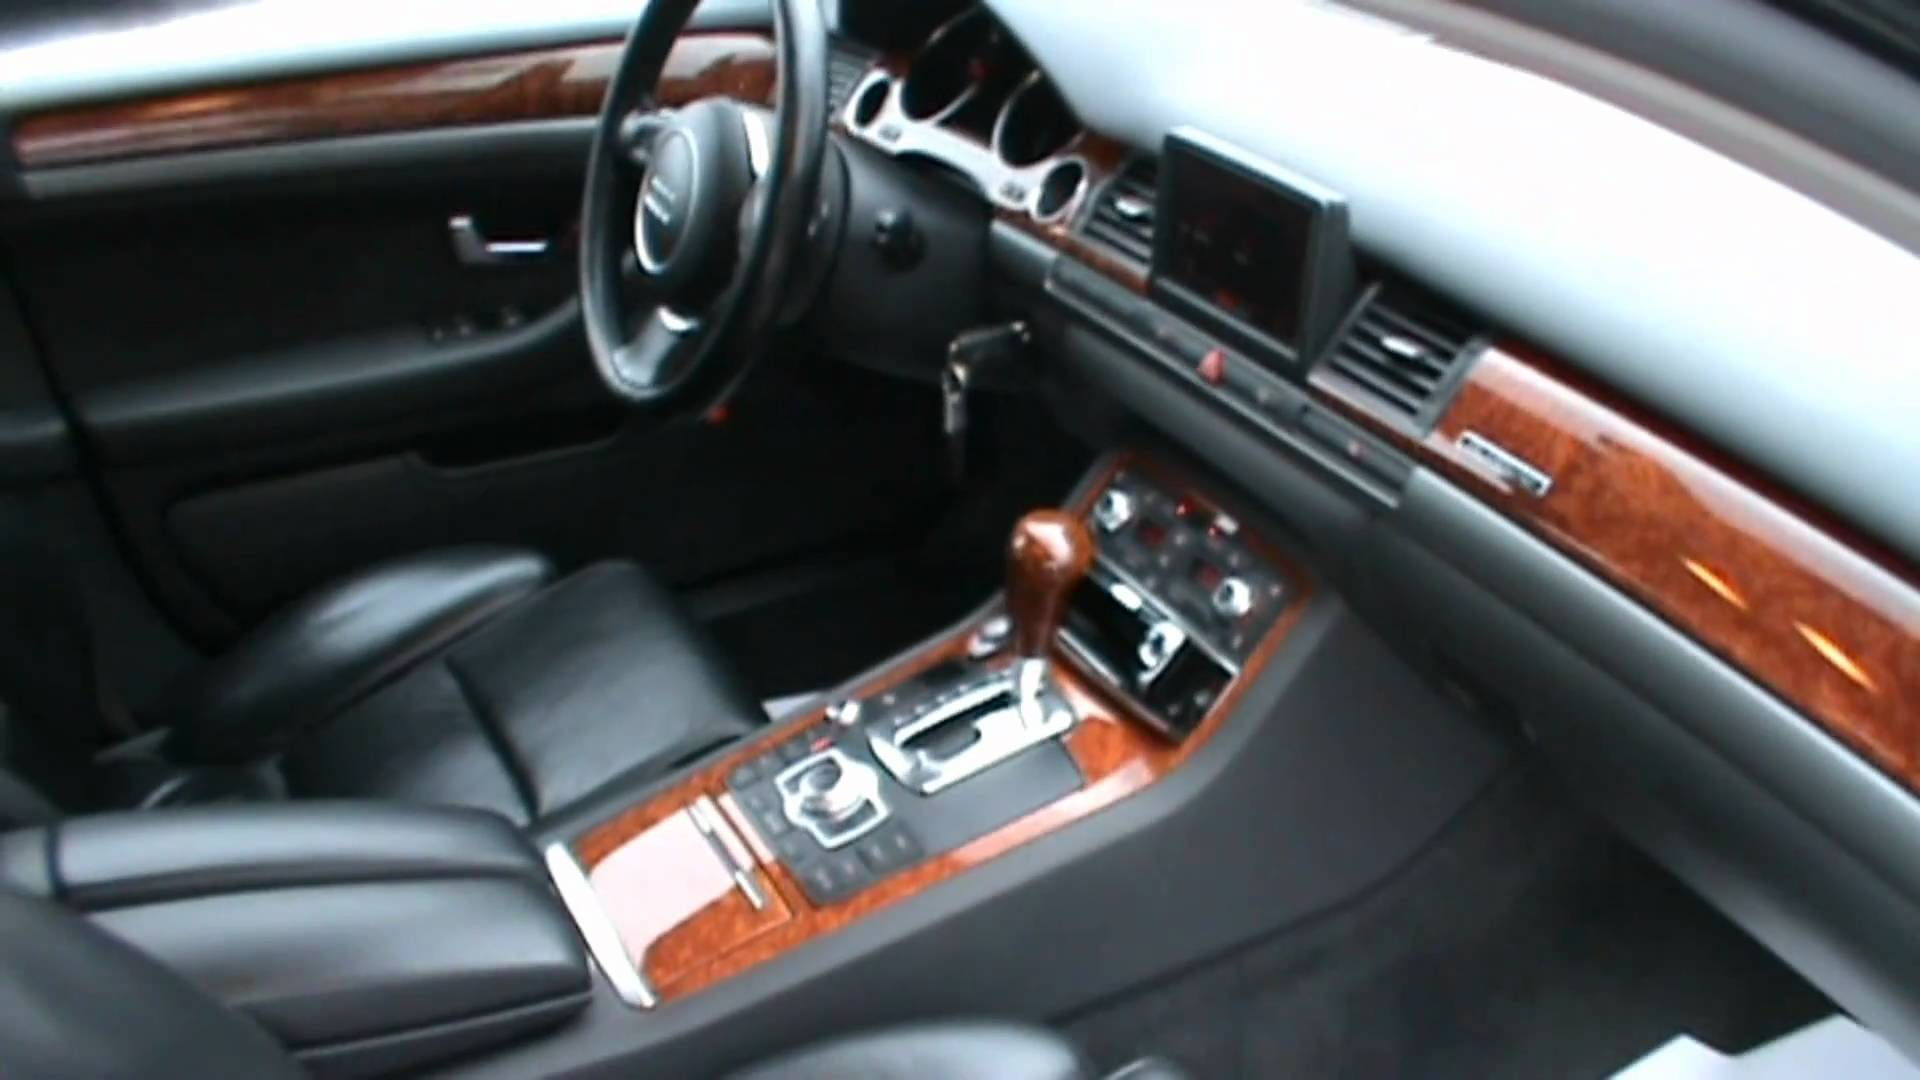 Audi A8 II (D3) Restyling 2005 - 2007 Sedan #1